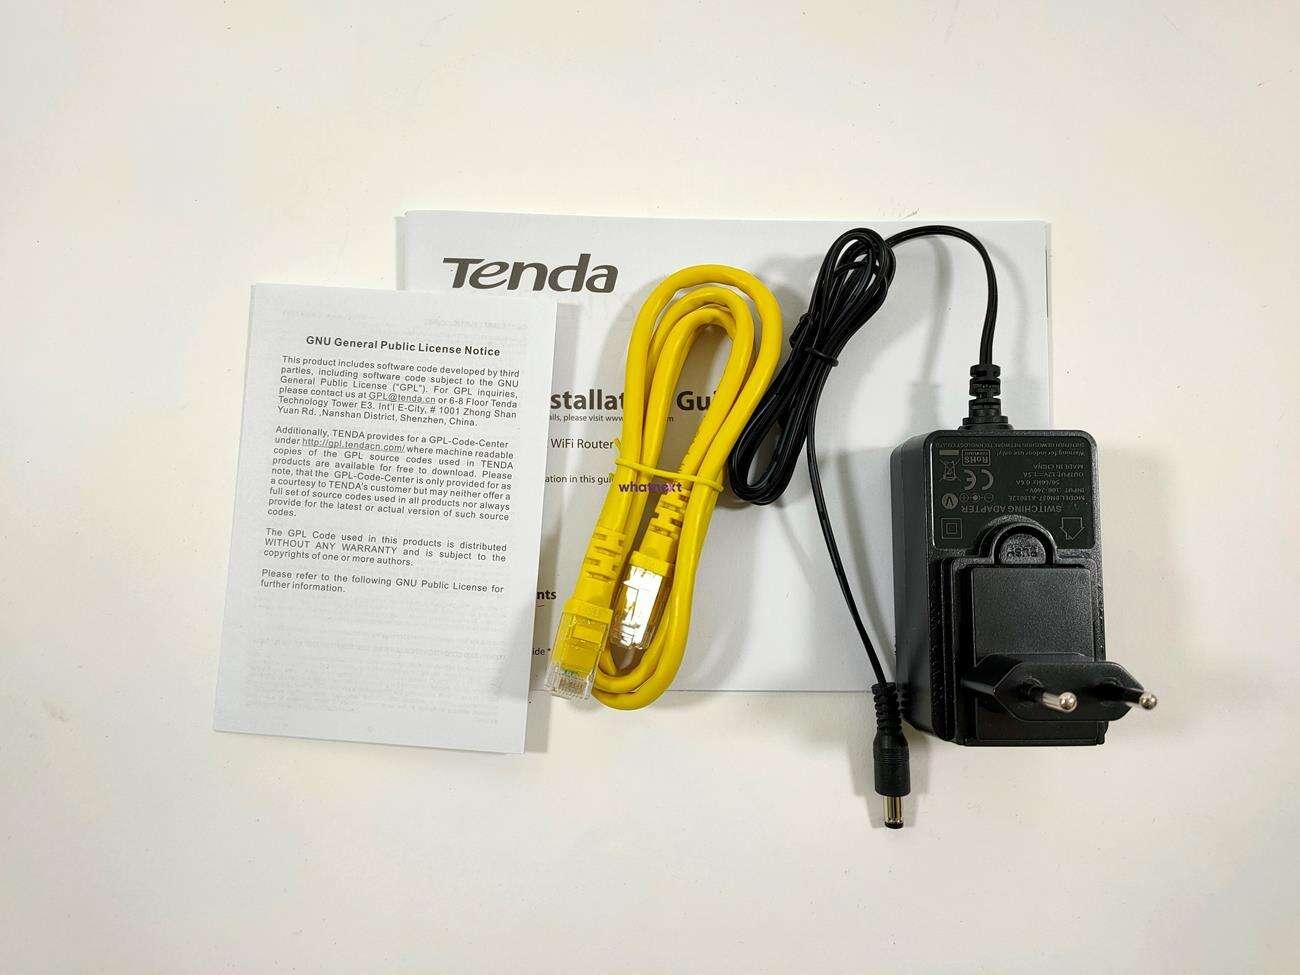 test Tenda AC23, recenzja Tenda AC23, review Tenda AC23, opinia Tenda AC23